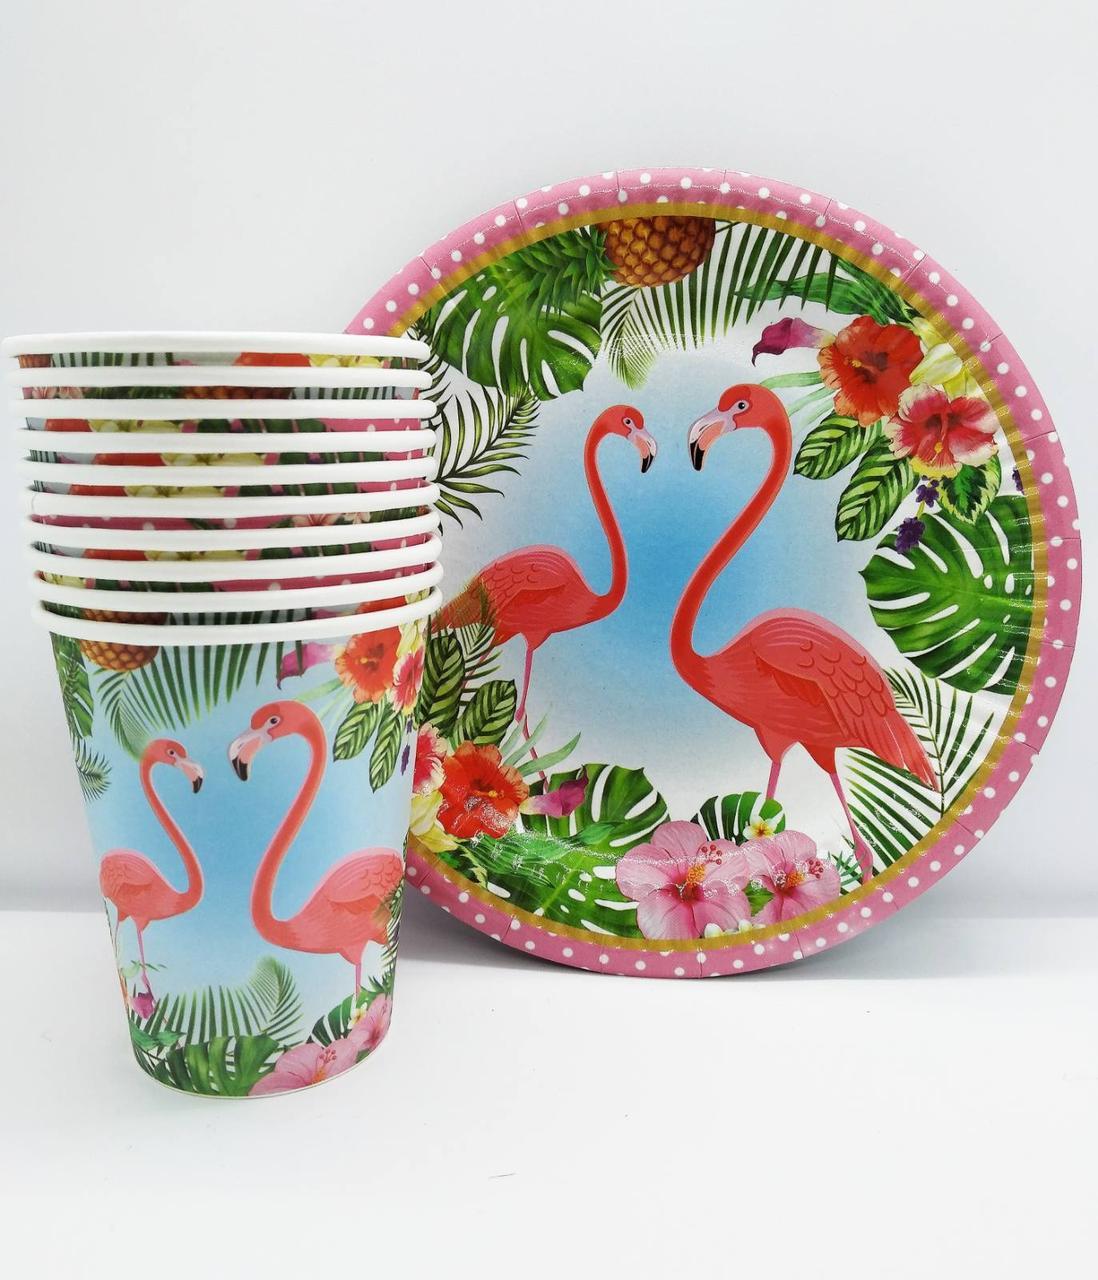 Набор одноразовой посуды для праздника Фламинго 10 стаканов, 10 тарелок